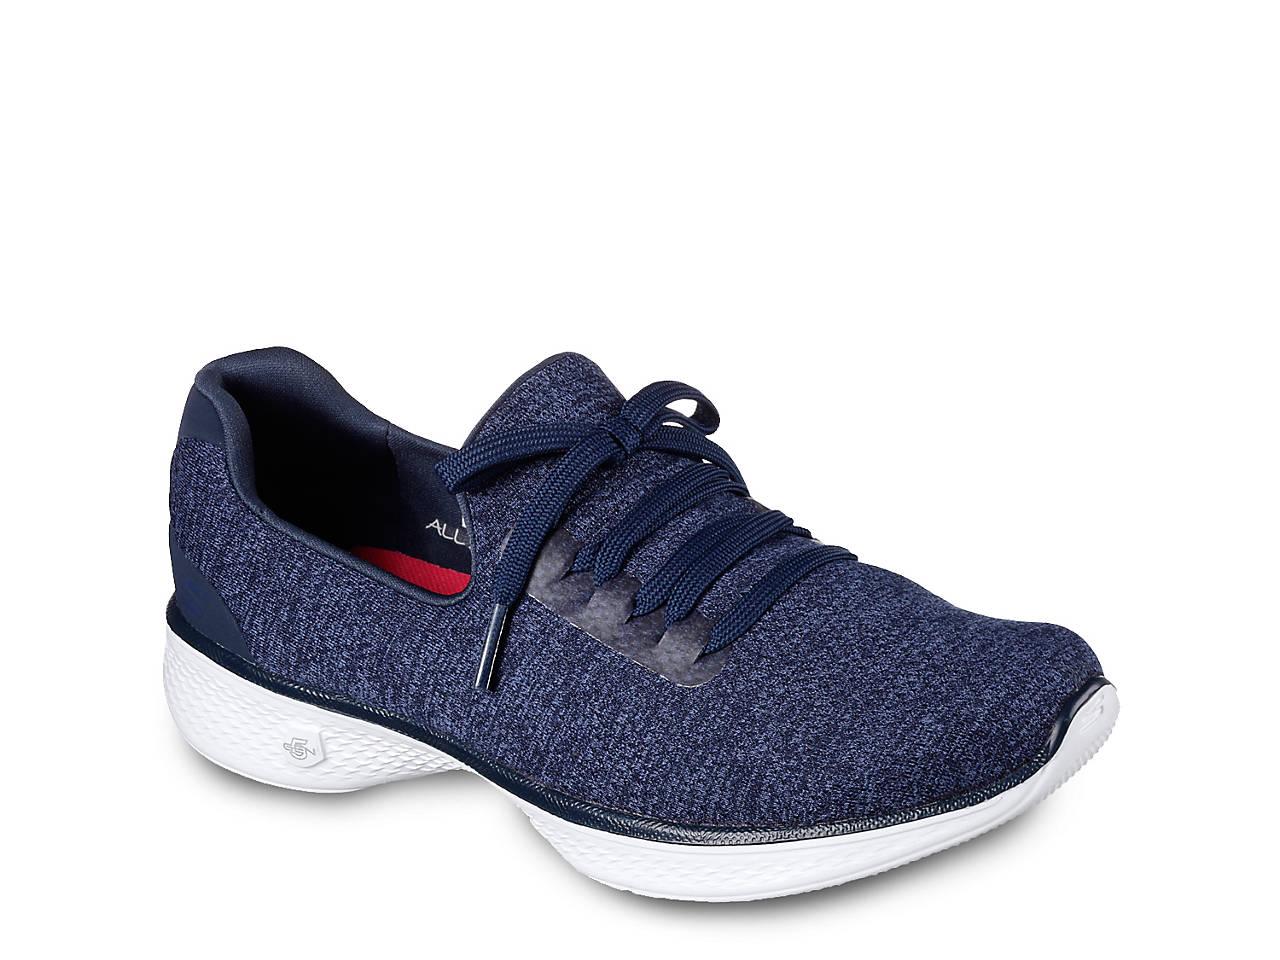 Best Plantar Fasciitis Shoes For Tennis